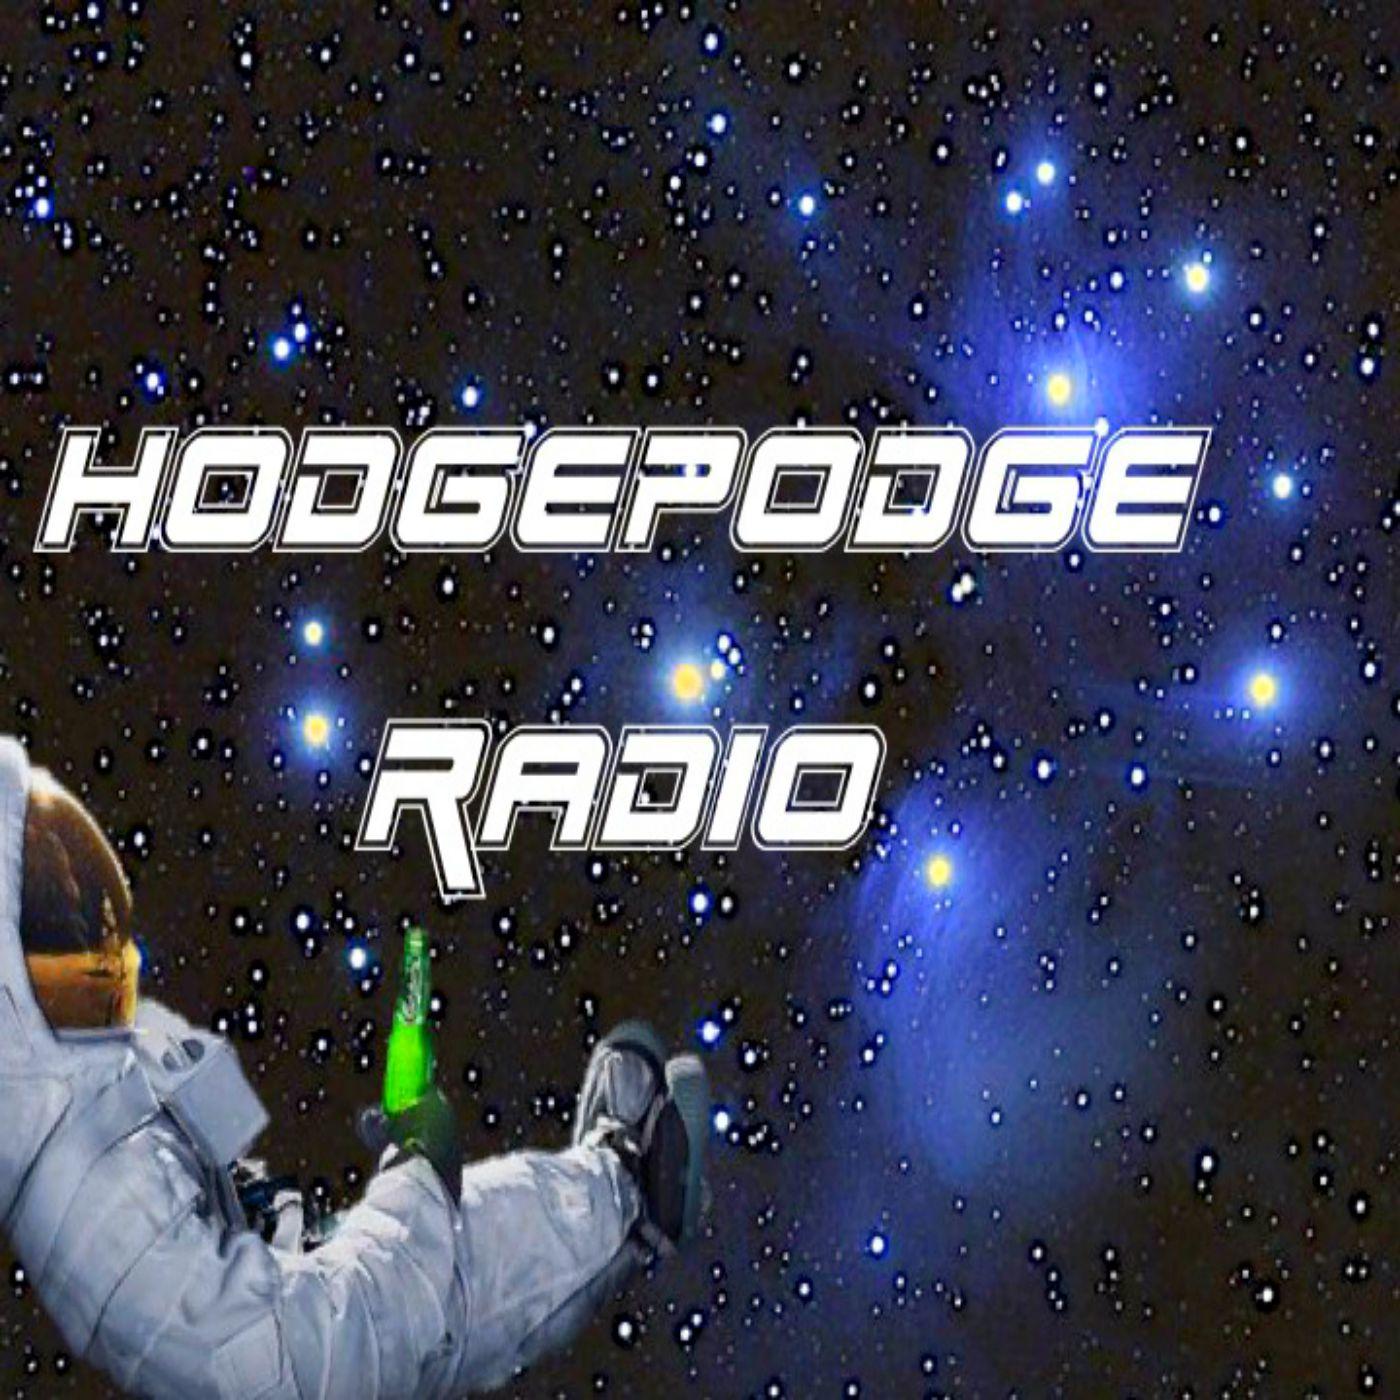 HodgePodge Radio